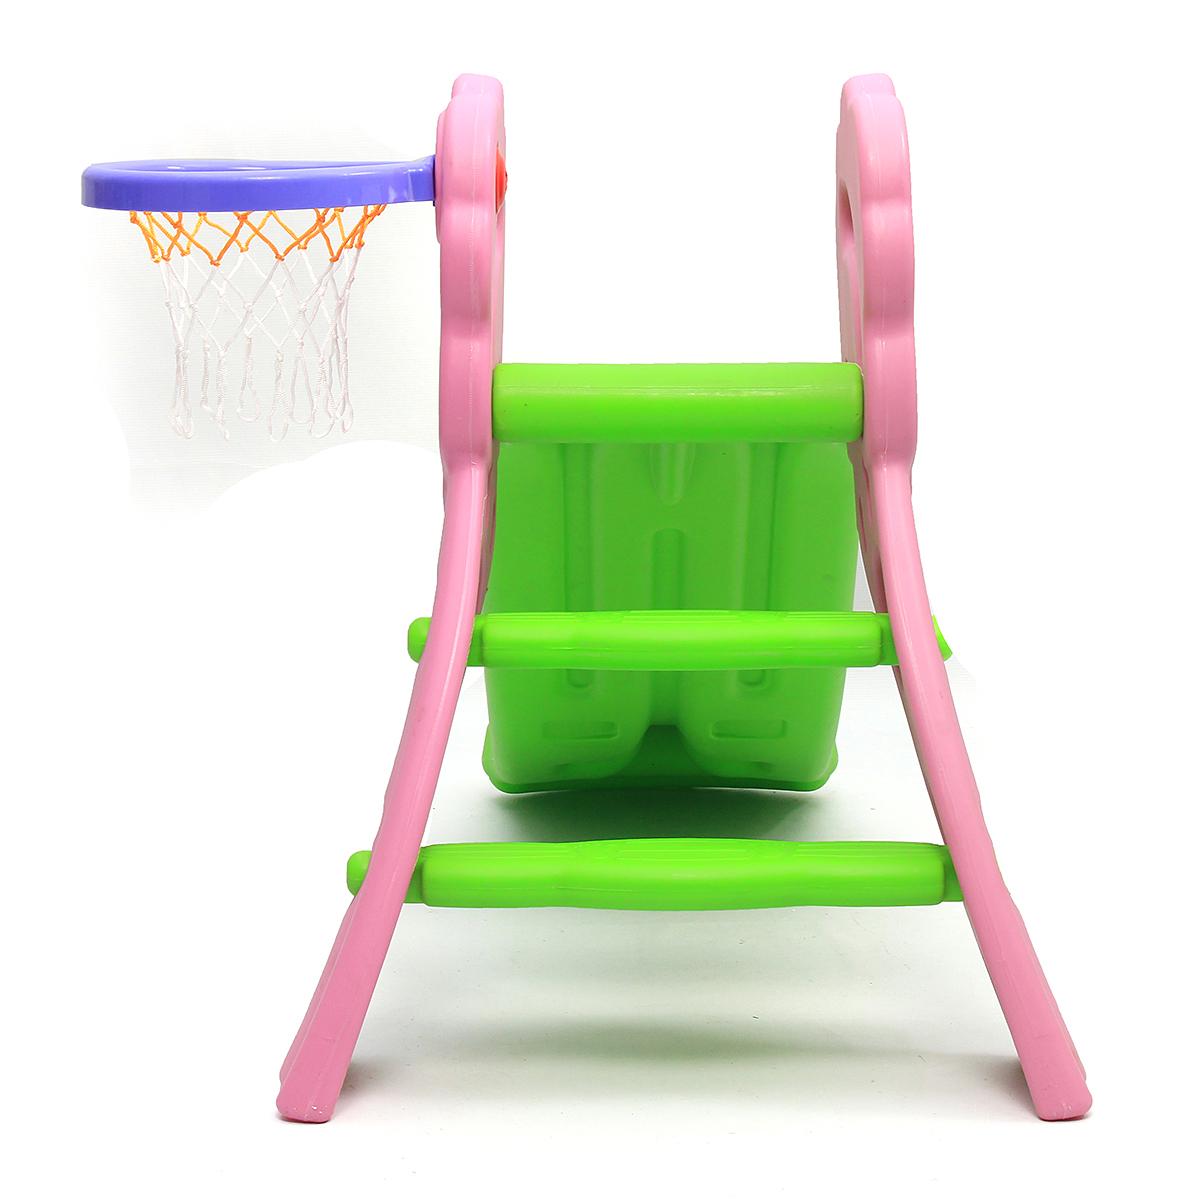 Outdoor Garden Yard Kids Mini Folding Slide With Basketball Basket Indoor Children Toys Slide